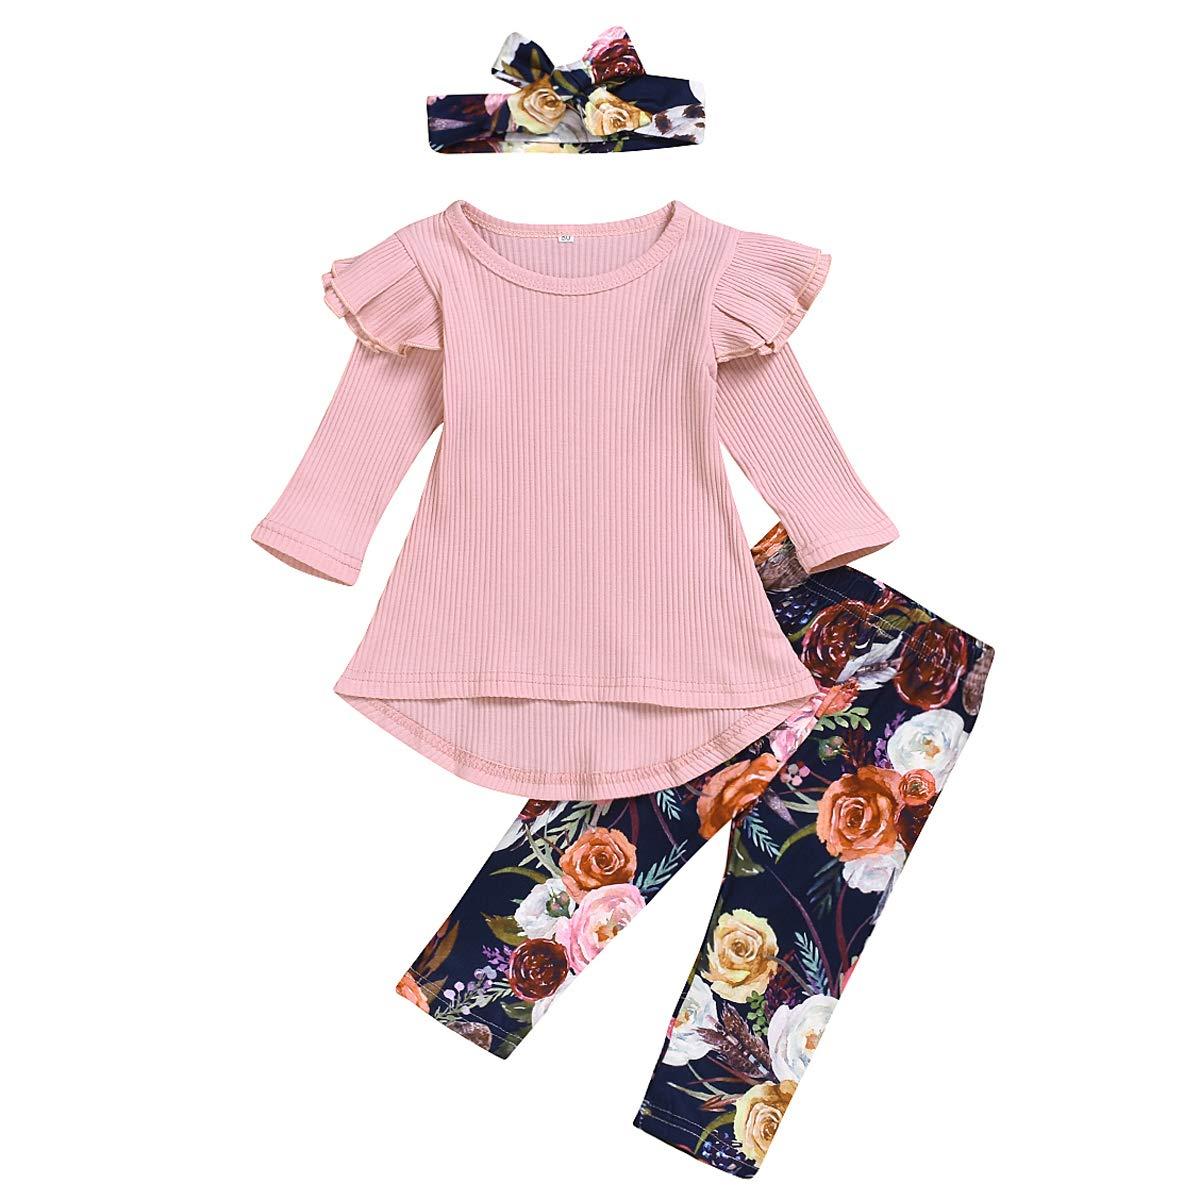 Baby Girls Floral Pants Set Infant Girl Ruffles Long Sleeve Shirts + Floral Pants + Hat + Bowknot Headband Outfits